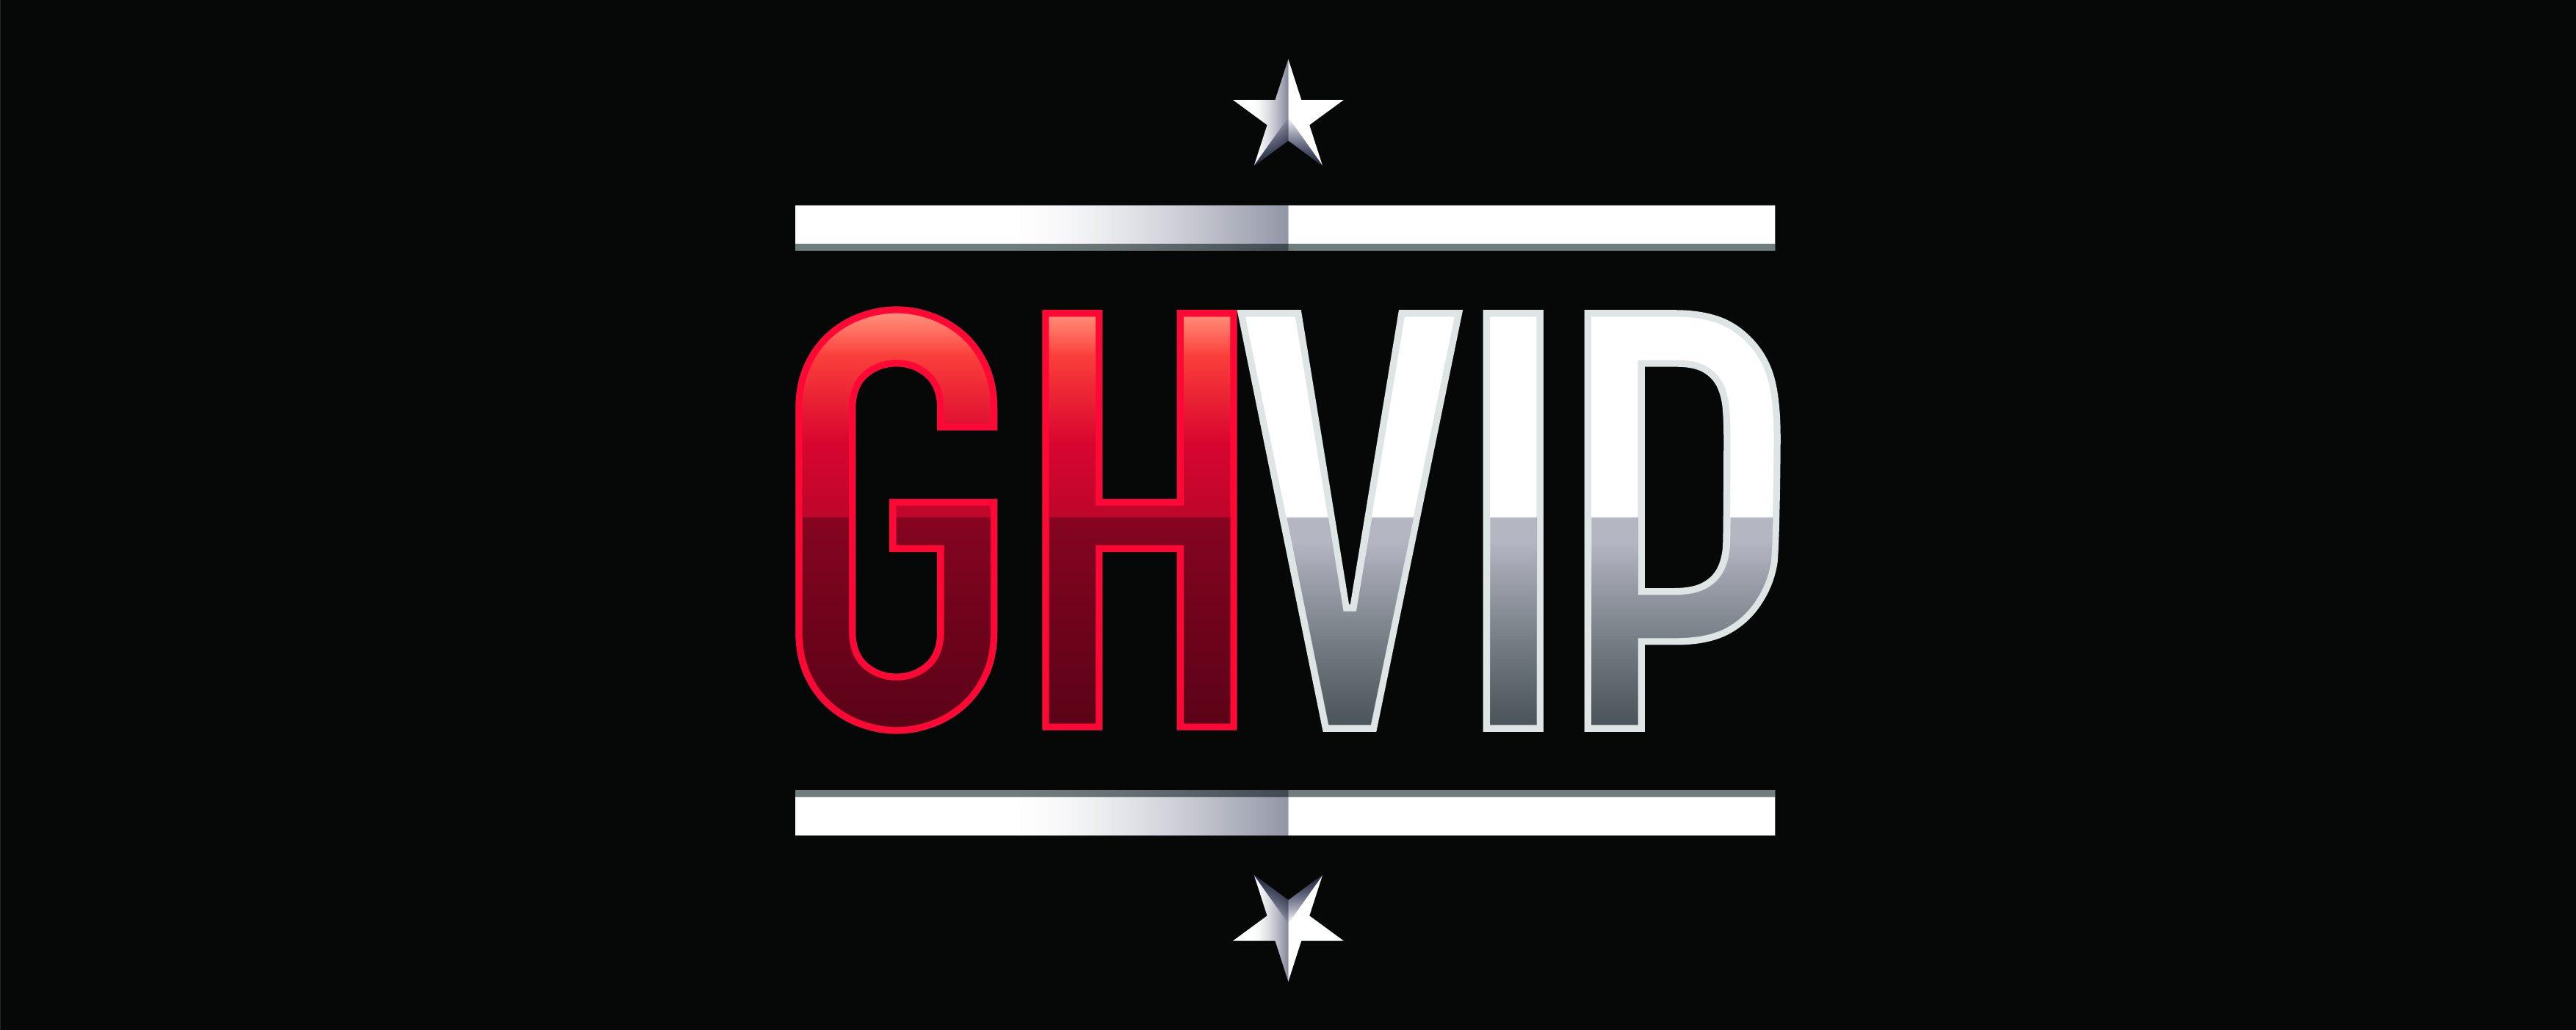 ghvip-logo.jpg_588b8084922d4